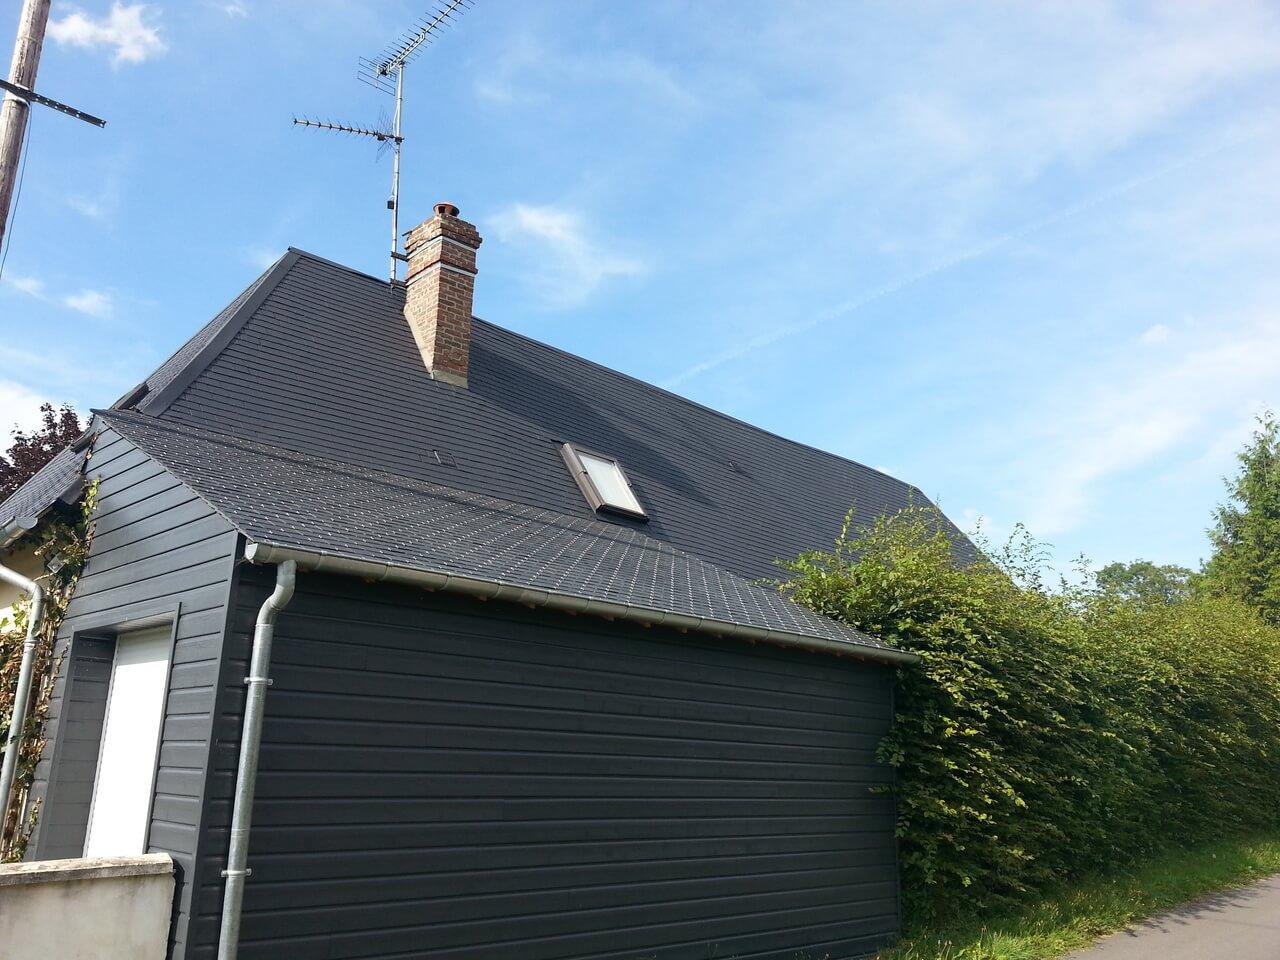 bardage extension maison Alençon